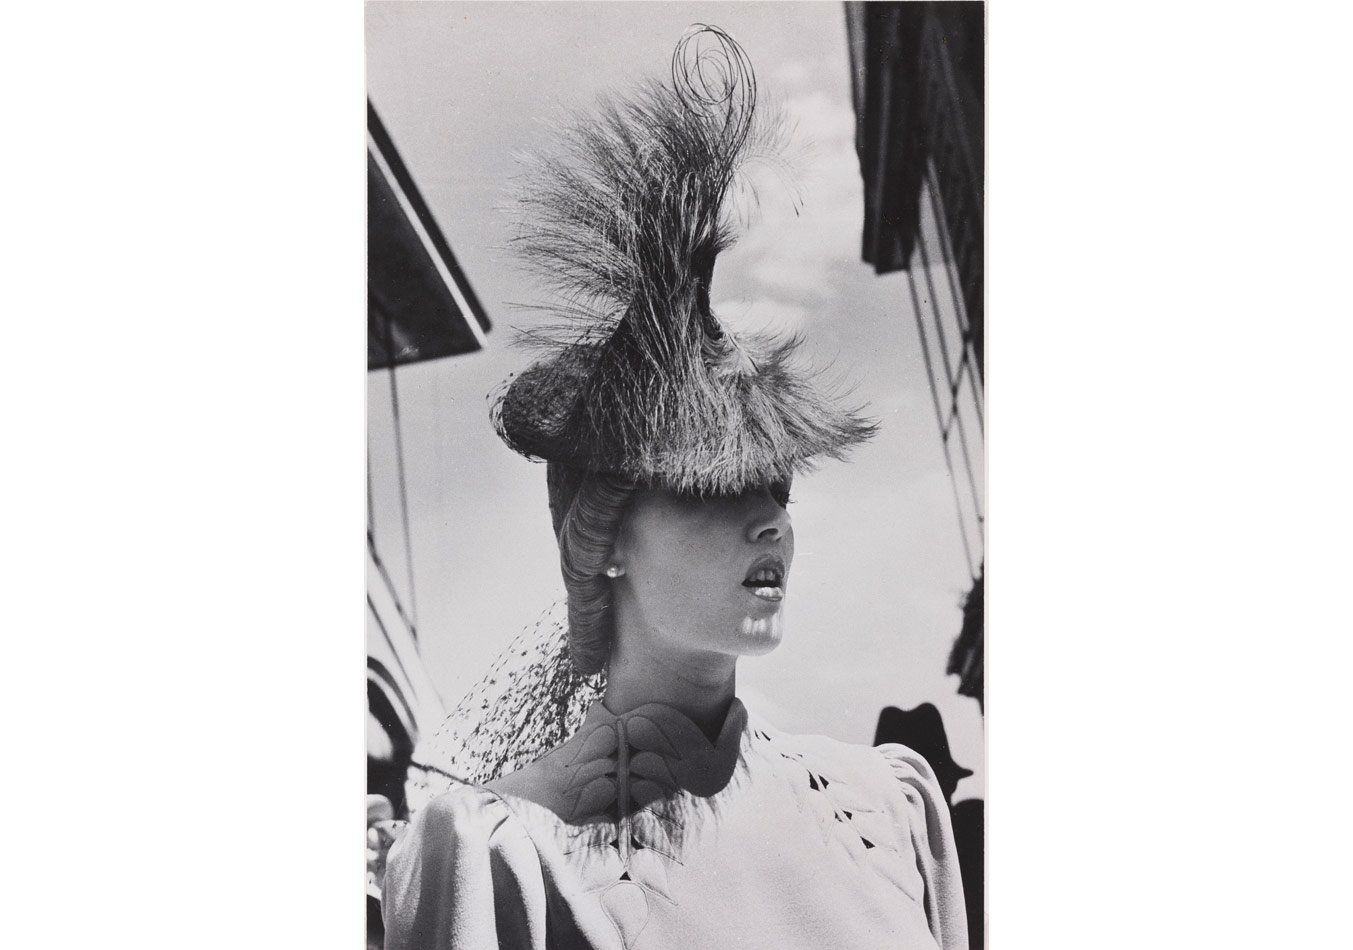 Regina Relang (1895-1989), Longchamp'taki yarışta, 1936 © Münchner Stadtmuseum, Sammlung Fotografie, Archiv Relang